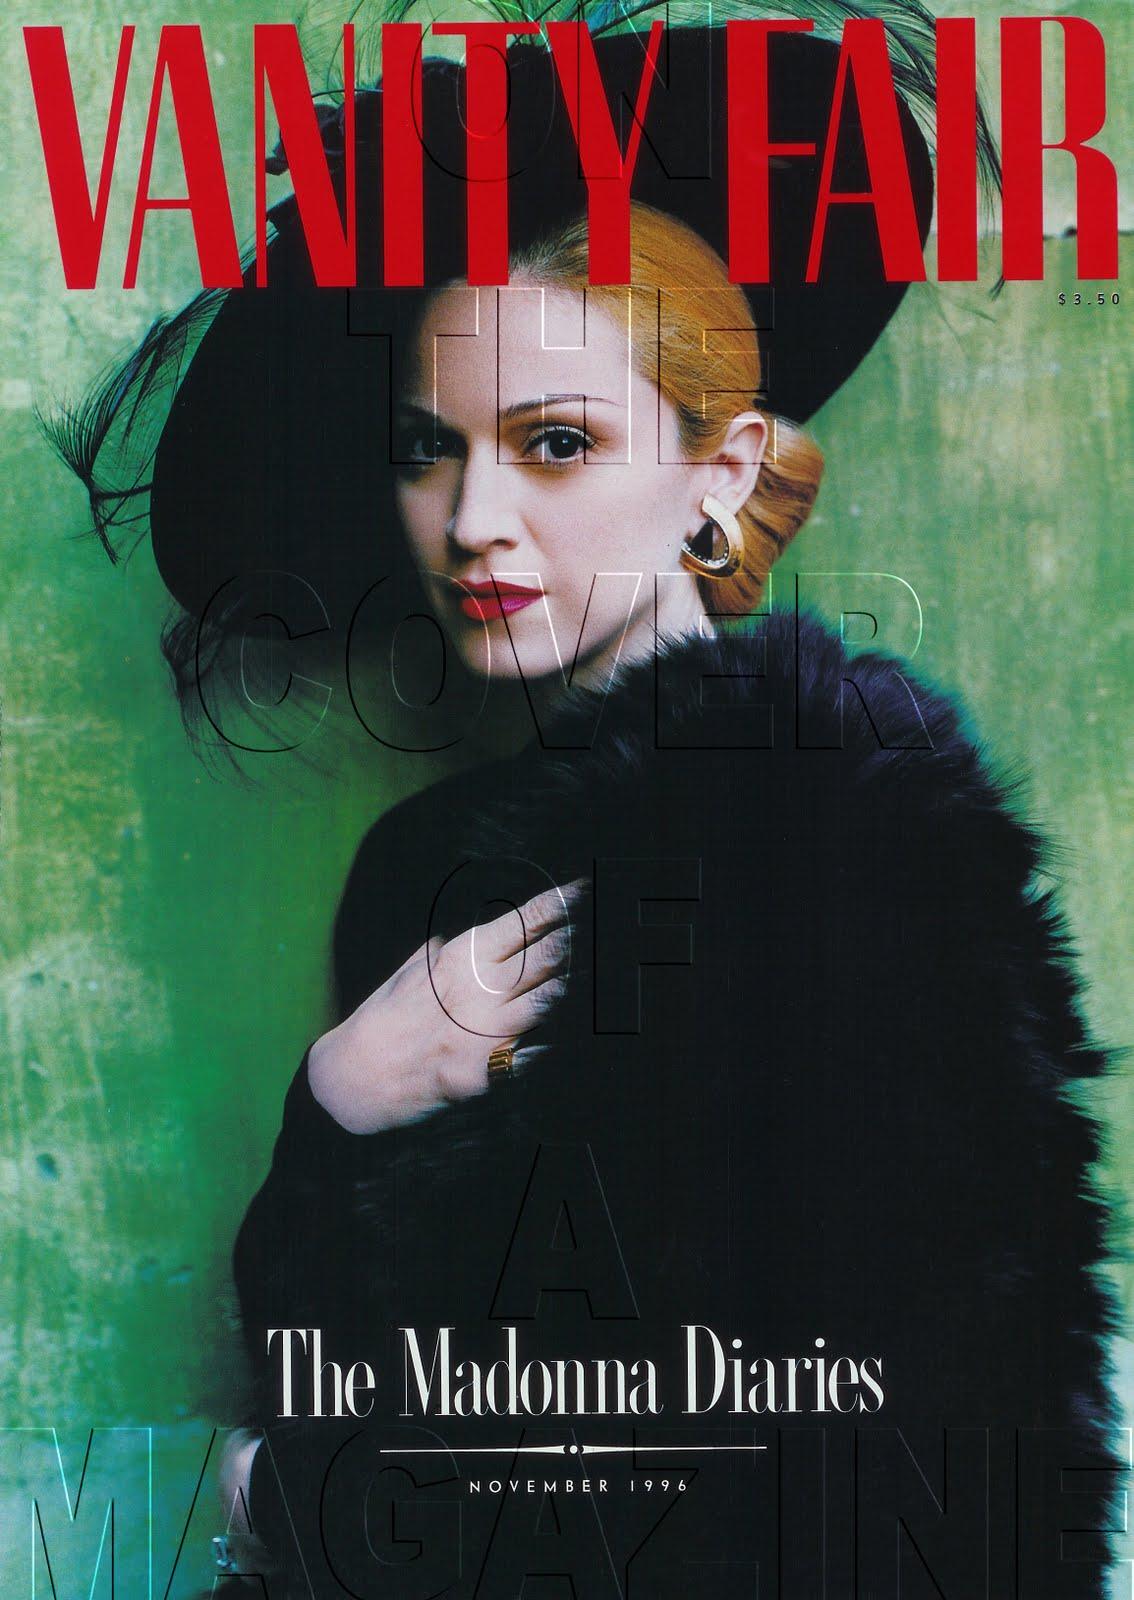 http://2.bp.blogspot.com/_eA7ZafYKvfU/TFCyWjo16PI/AAAAAAAADl4/YekhMwJktTM/s1600/Vanity+Fair+USA+November+1996+Mario+Testino+copy.jpg